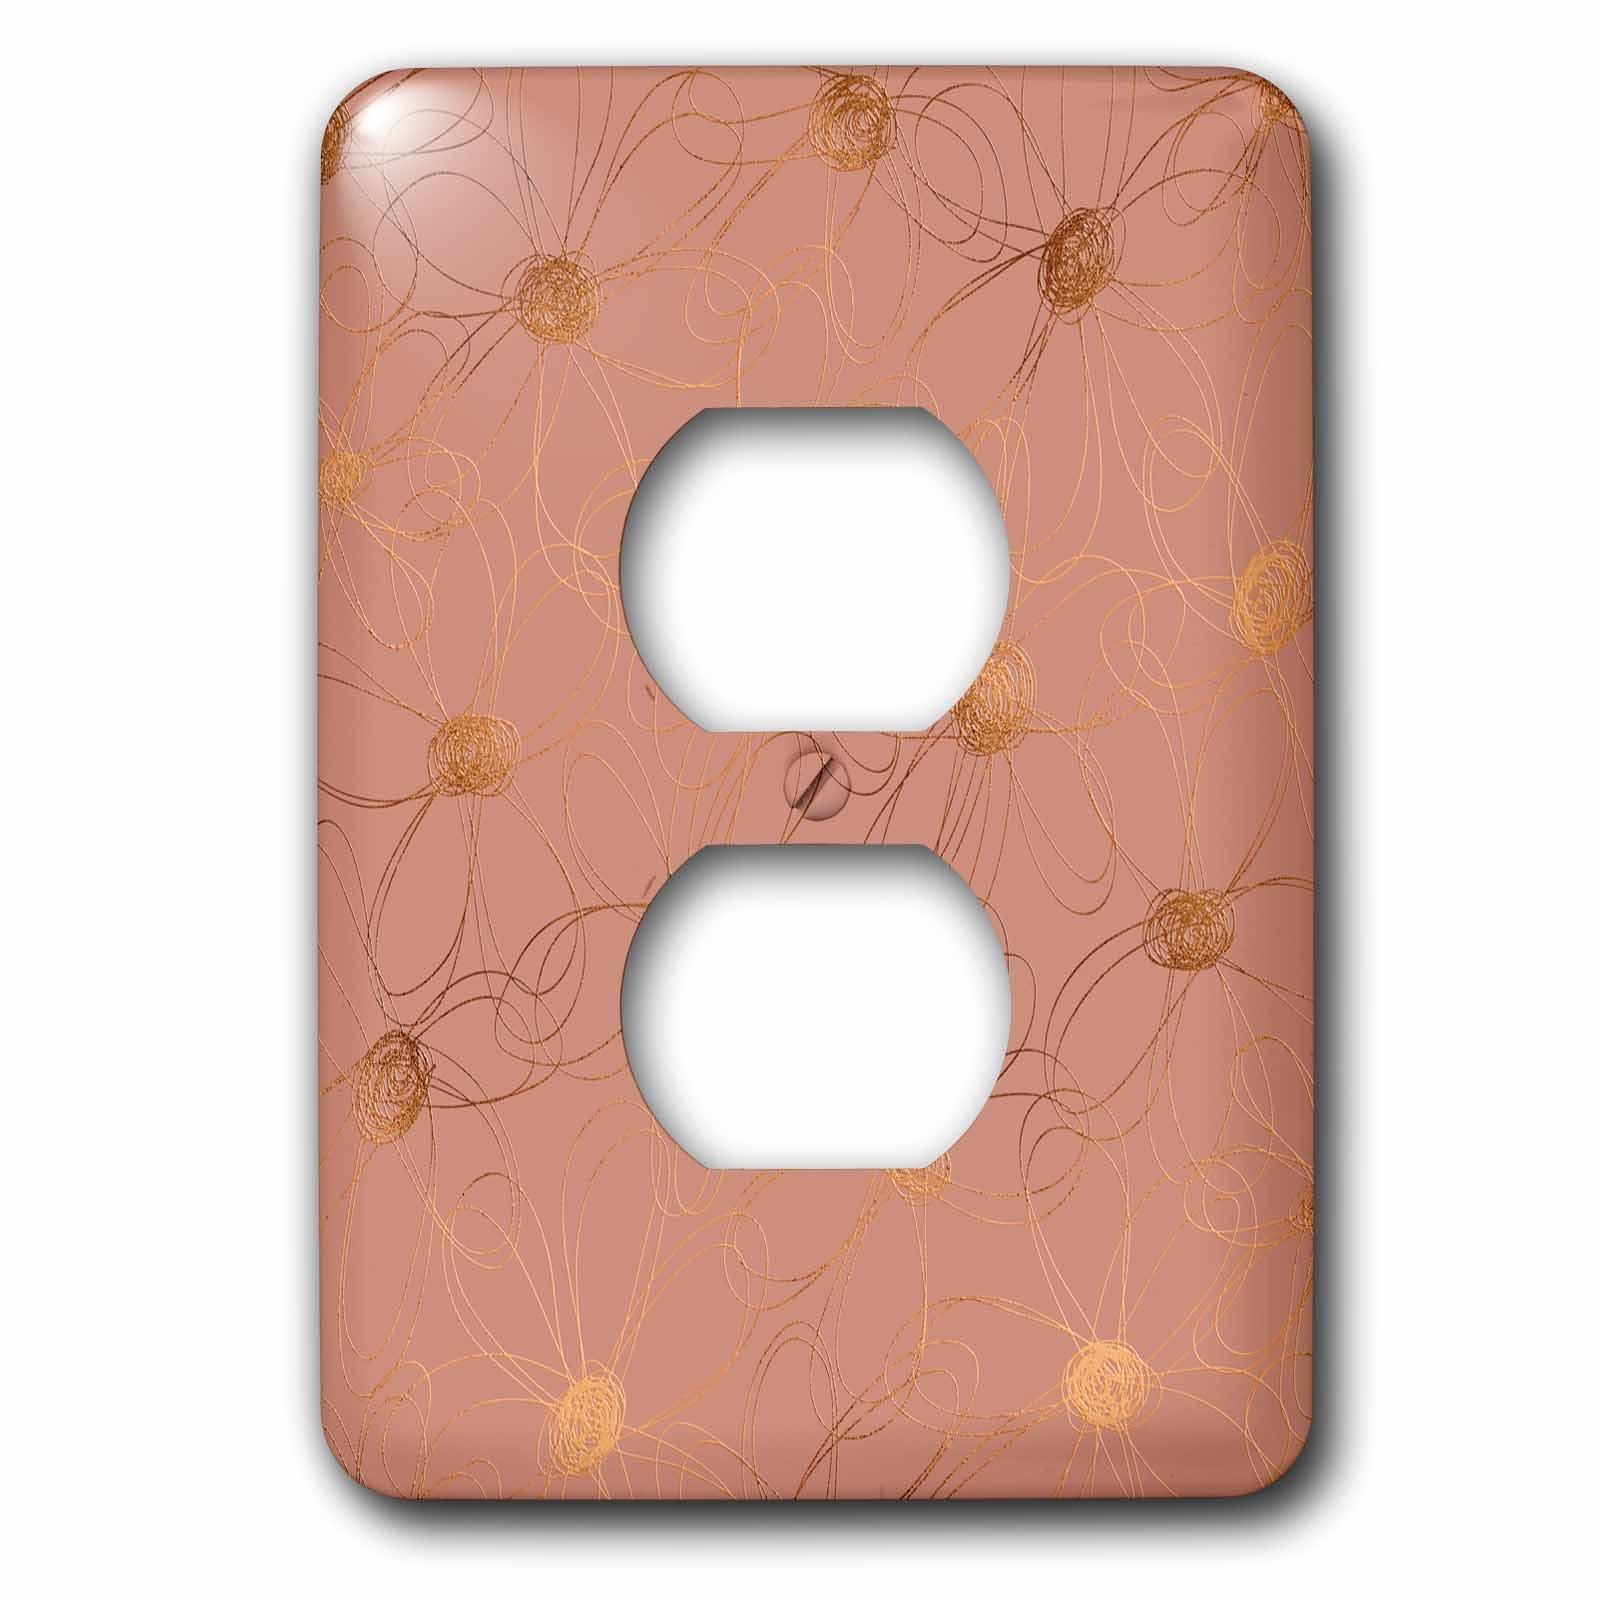 3dRose Uta Naumann Faux Glitter Pattern - Luxury Shiny Elegant Rose Gold Copper Damask Pattern - Light Switch Covers - 2 plug outlet cover (lsp_272881_6)